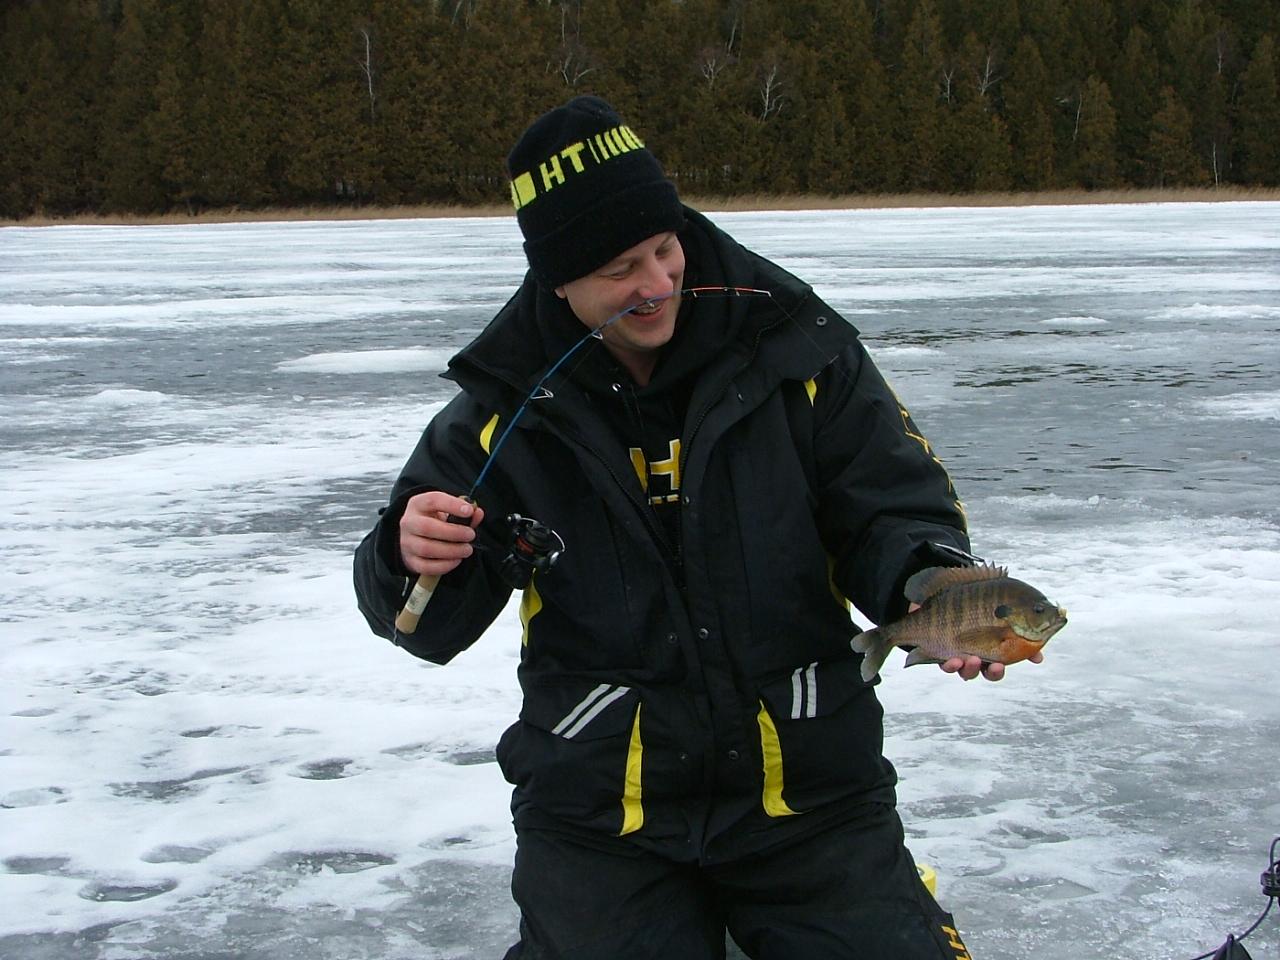 Tips for catching bluegills